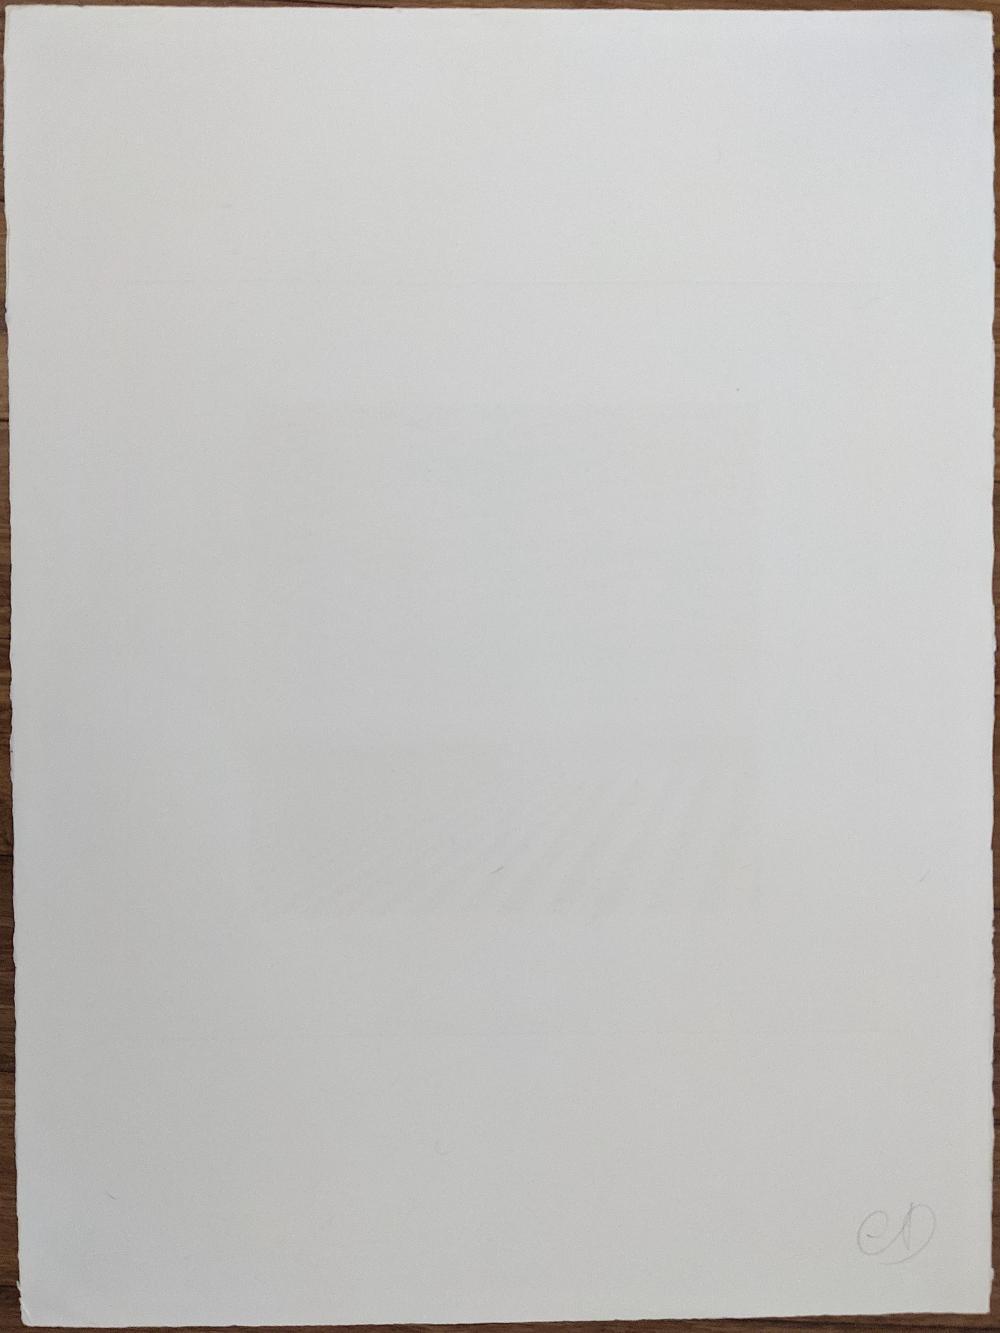 JEAN SOLOMBRE Hand Signed Aquatint Engraving 25/25